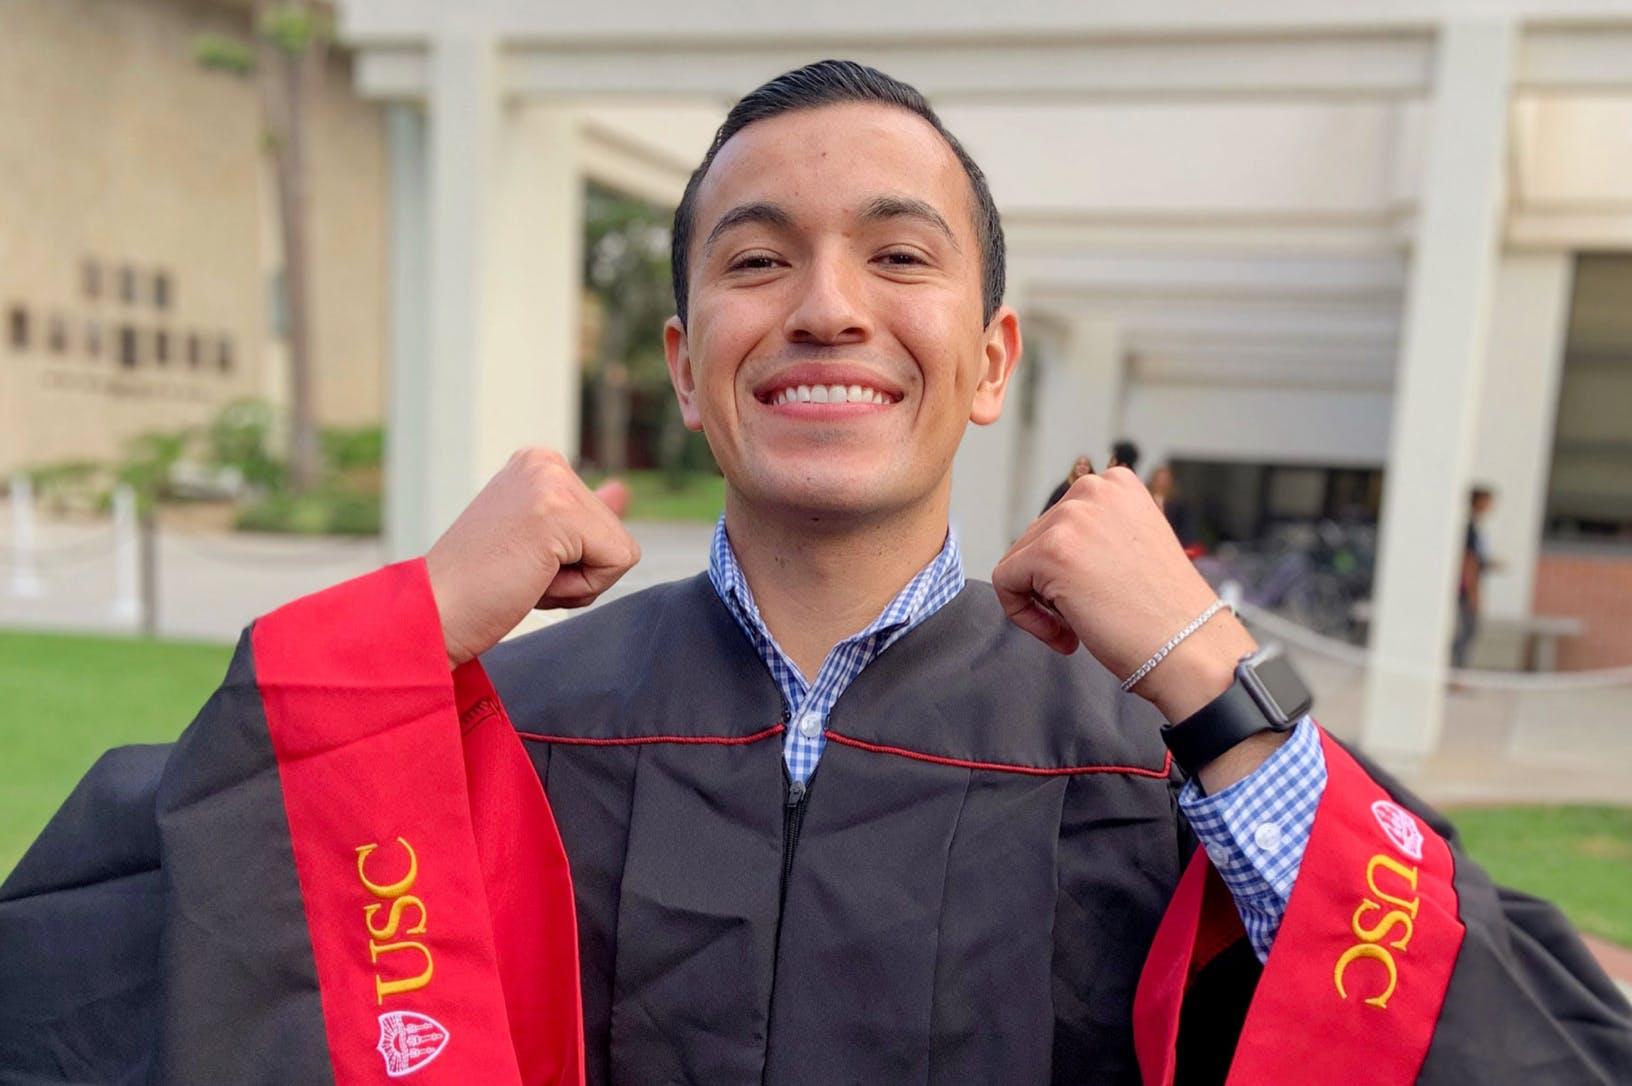 Graduating male smiling